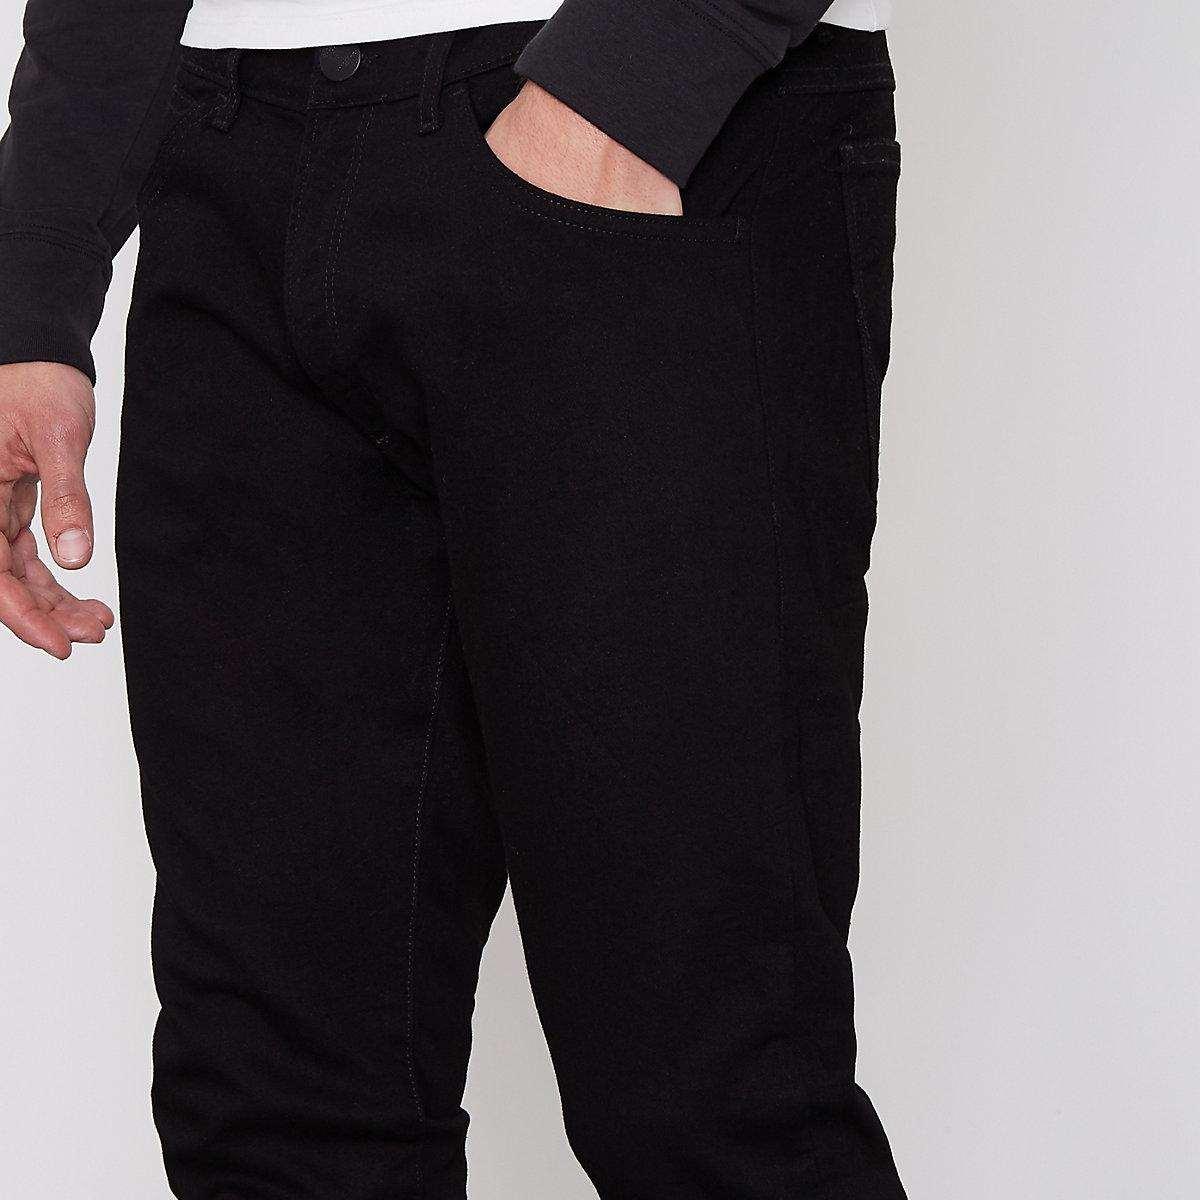 Bryson Men Wrangler Jeans Black Skinny Fit qxqwr1B5